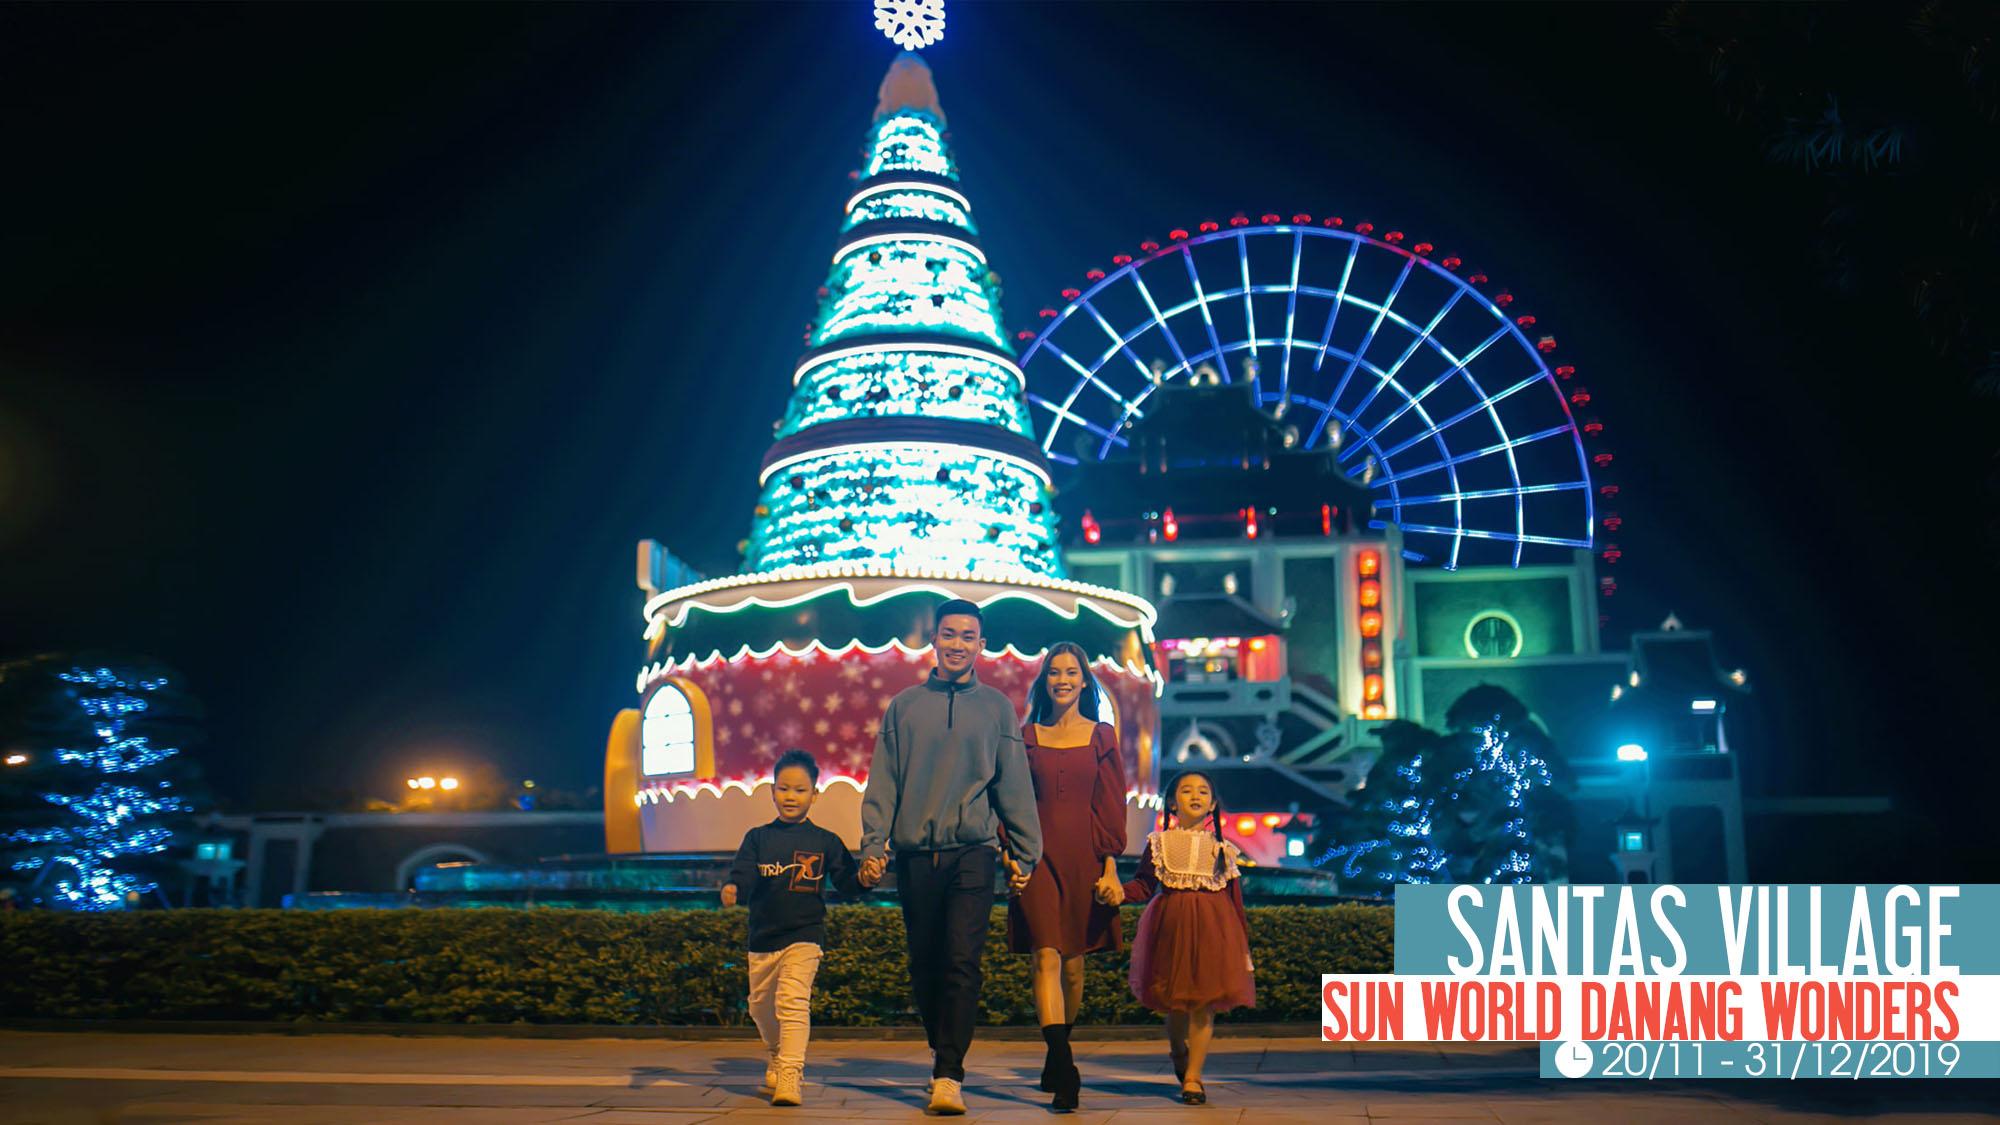 Santas Village Sunworld Danang Wonders Cac Su Kien Noi Bat Da Nang Quang Nam Thang 12 2019 Chao Nam Moi 01